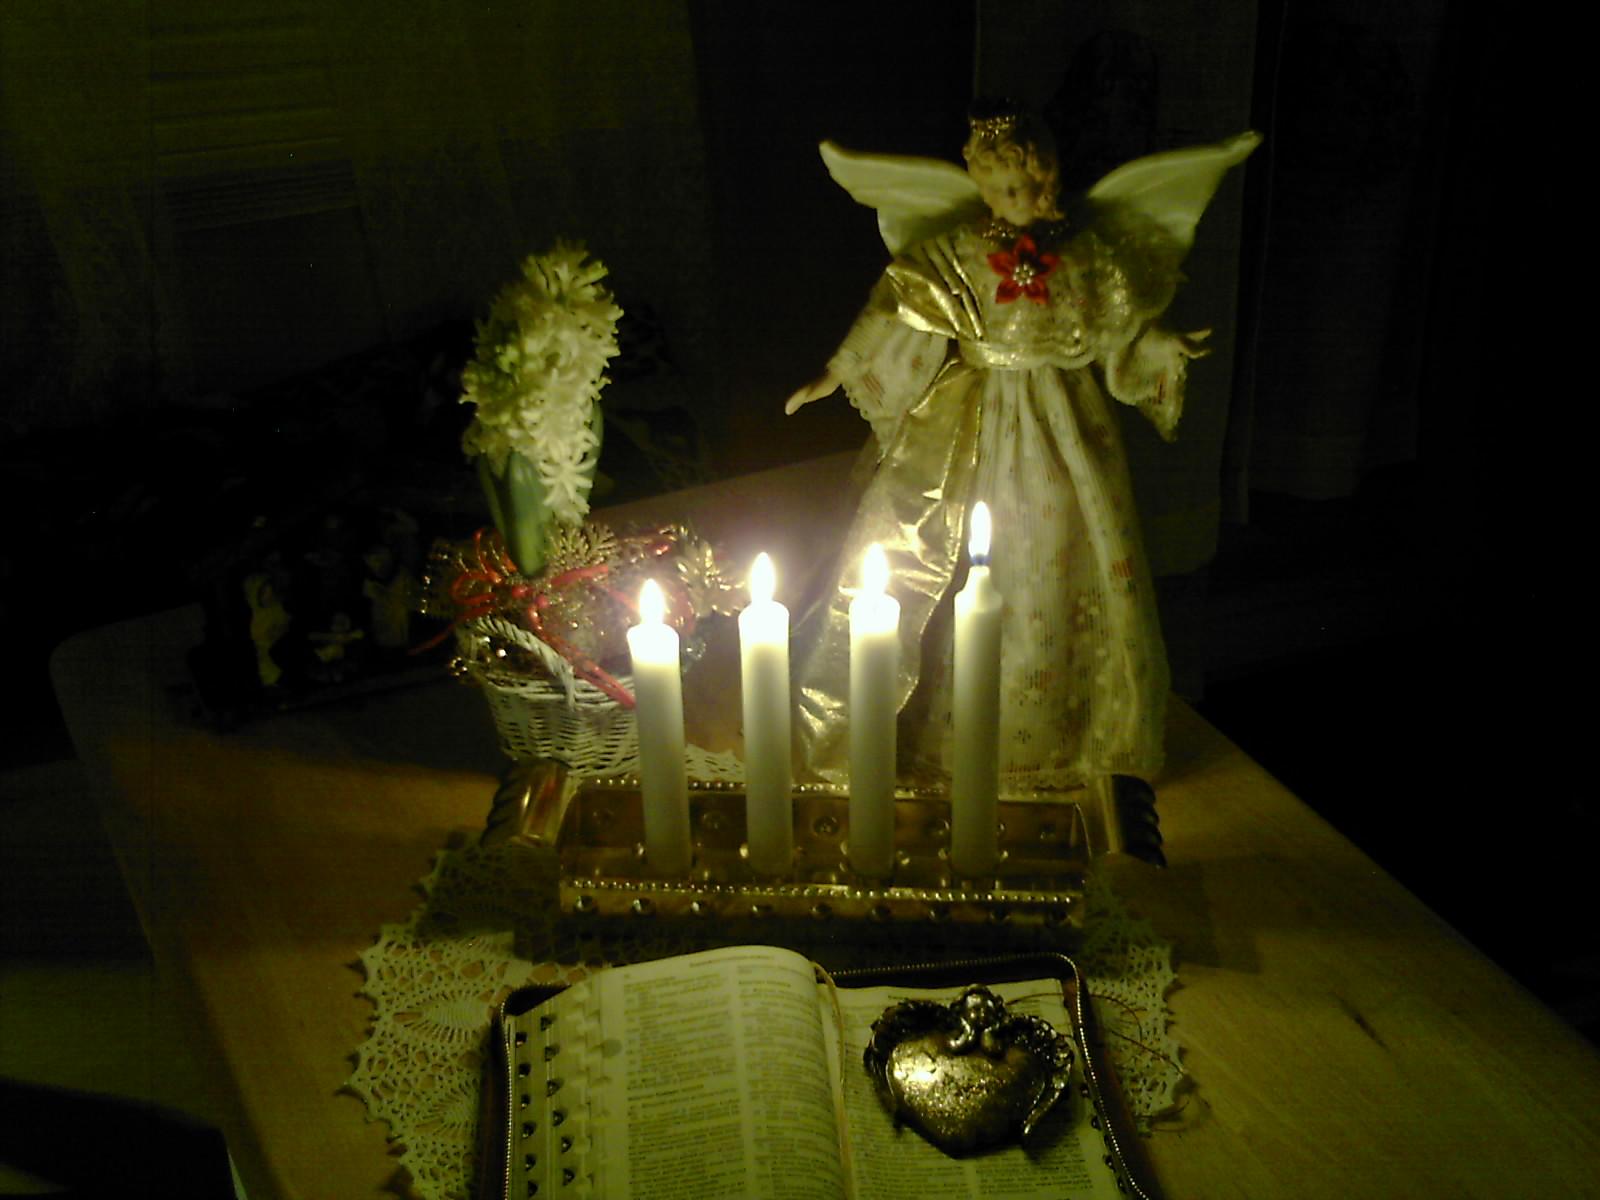 [neljäs+kynttilä+19.12.09+2]